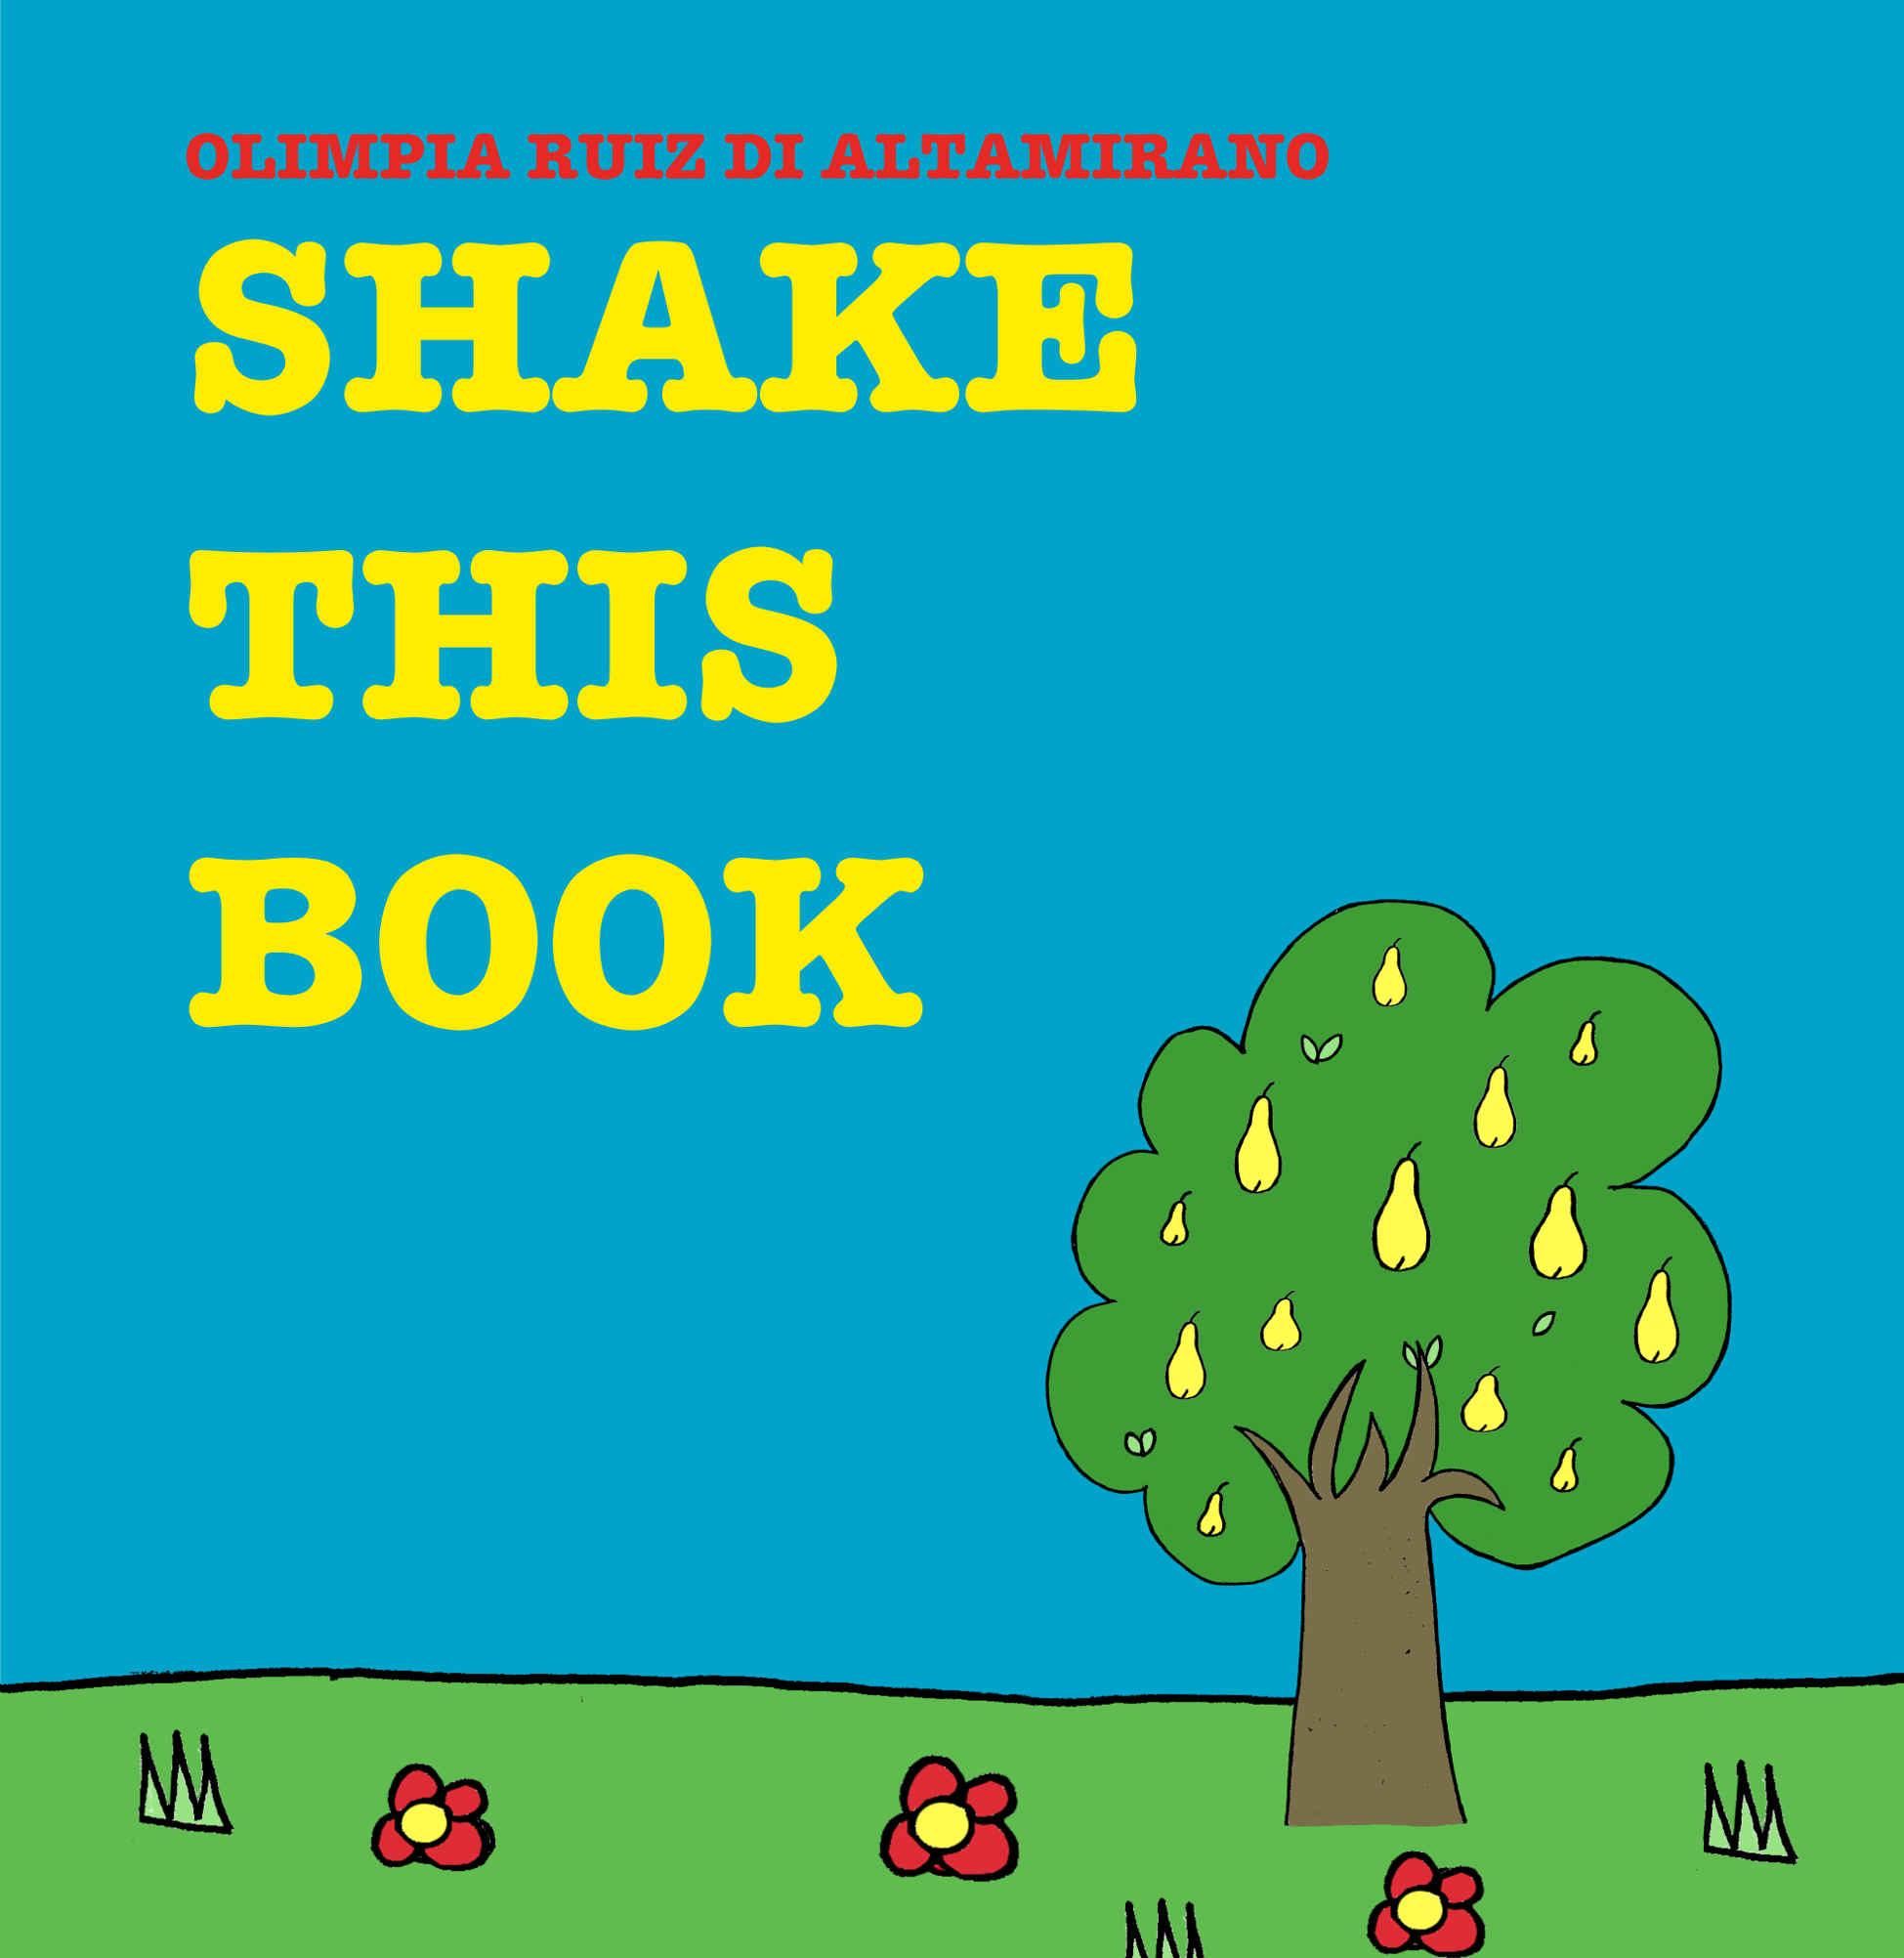 Shake this book